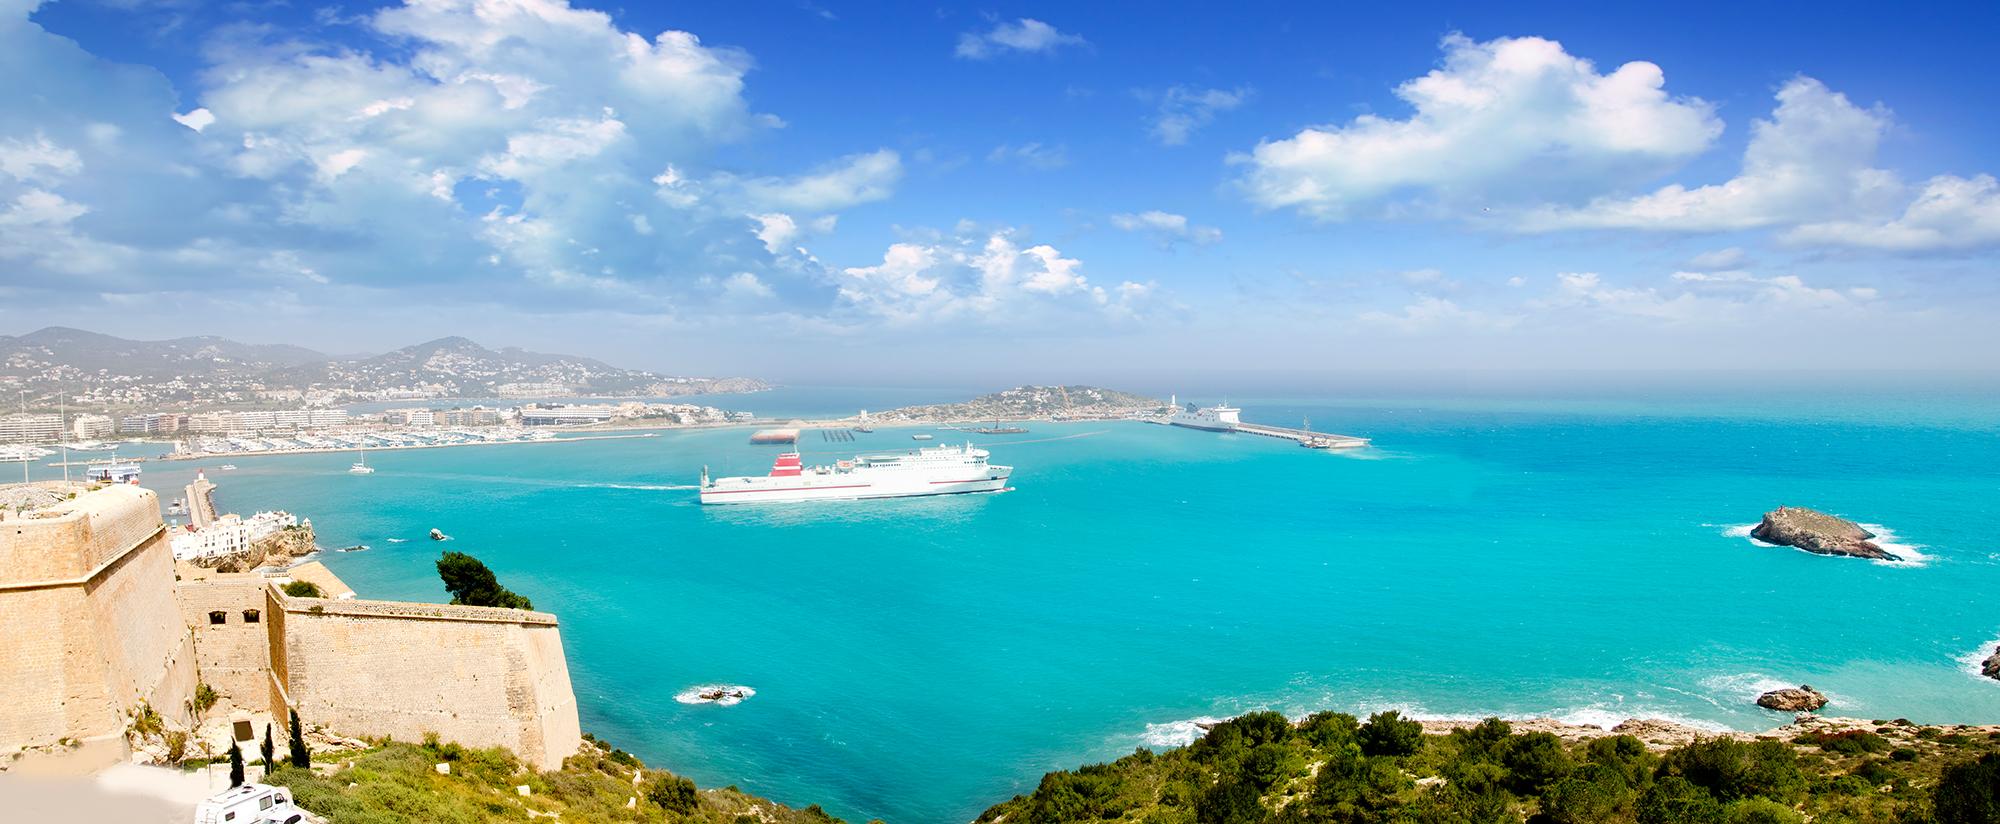 Flug Und Hotel San Antonio Ibiza